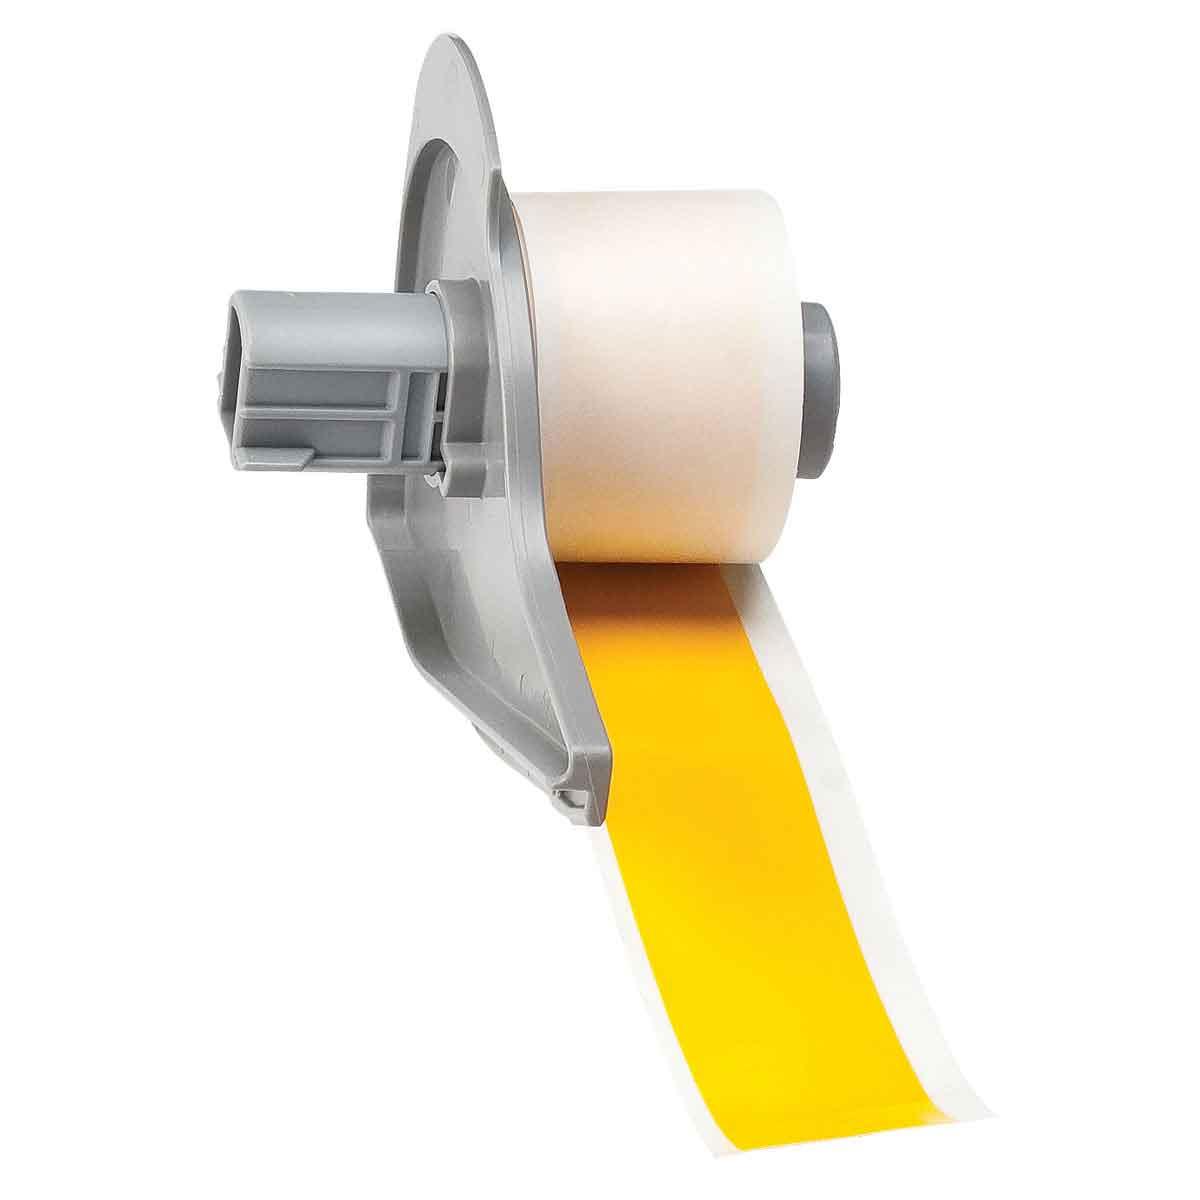 Brady® M71C-1000-595-YL Blank Thermal Transfer Tape, 50 ft L x 1 in W, Yellow, B-595 Vinyl, Permanent Acrylic Adhesive, -40 to 180 deg F